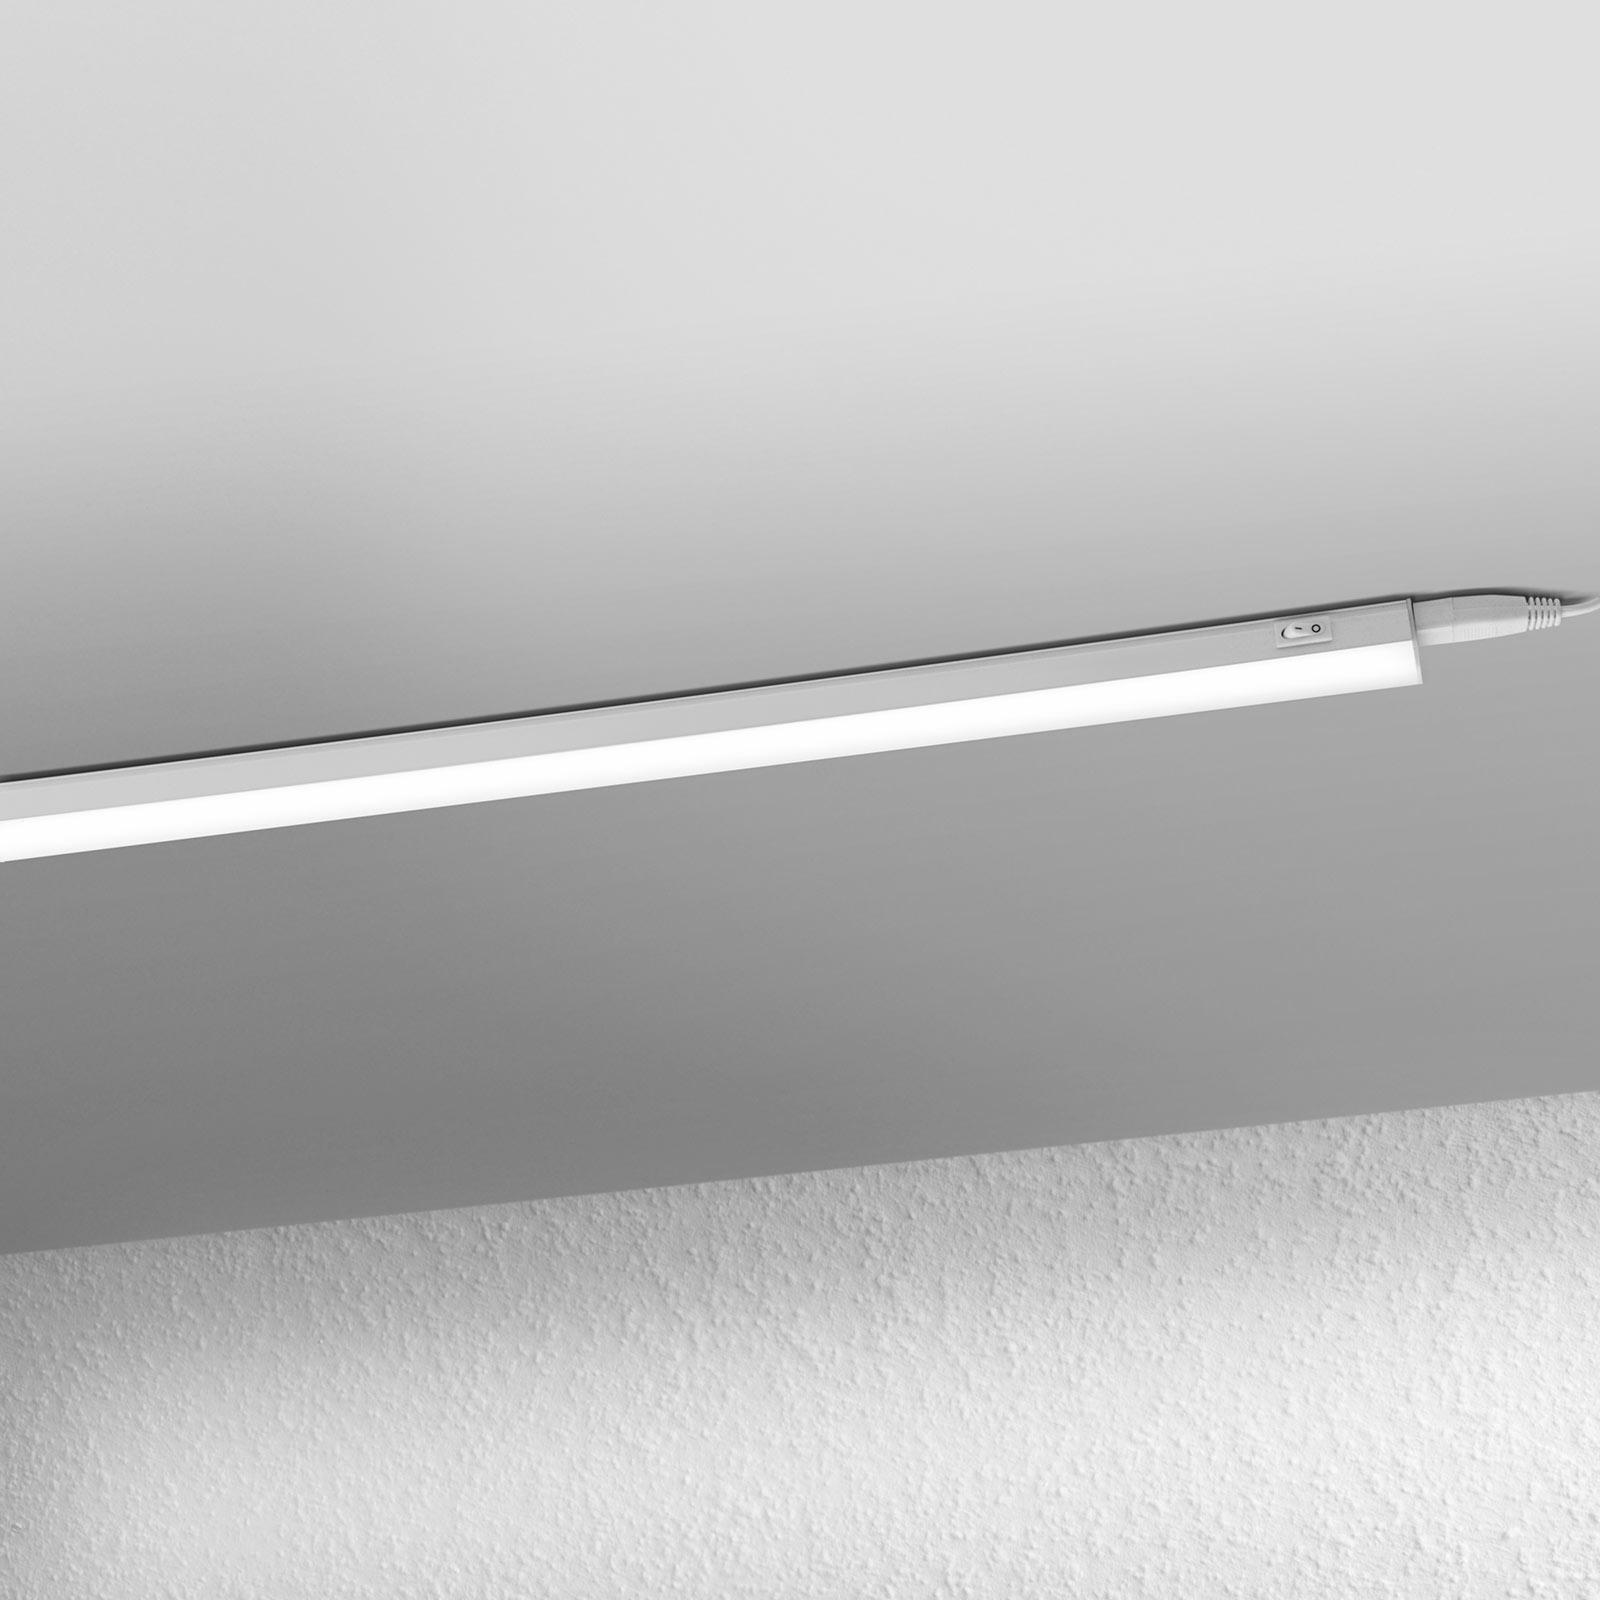 LEDVANCE Batten -LED-kaapinalusvalo 30 cm 3 000 K